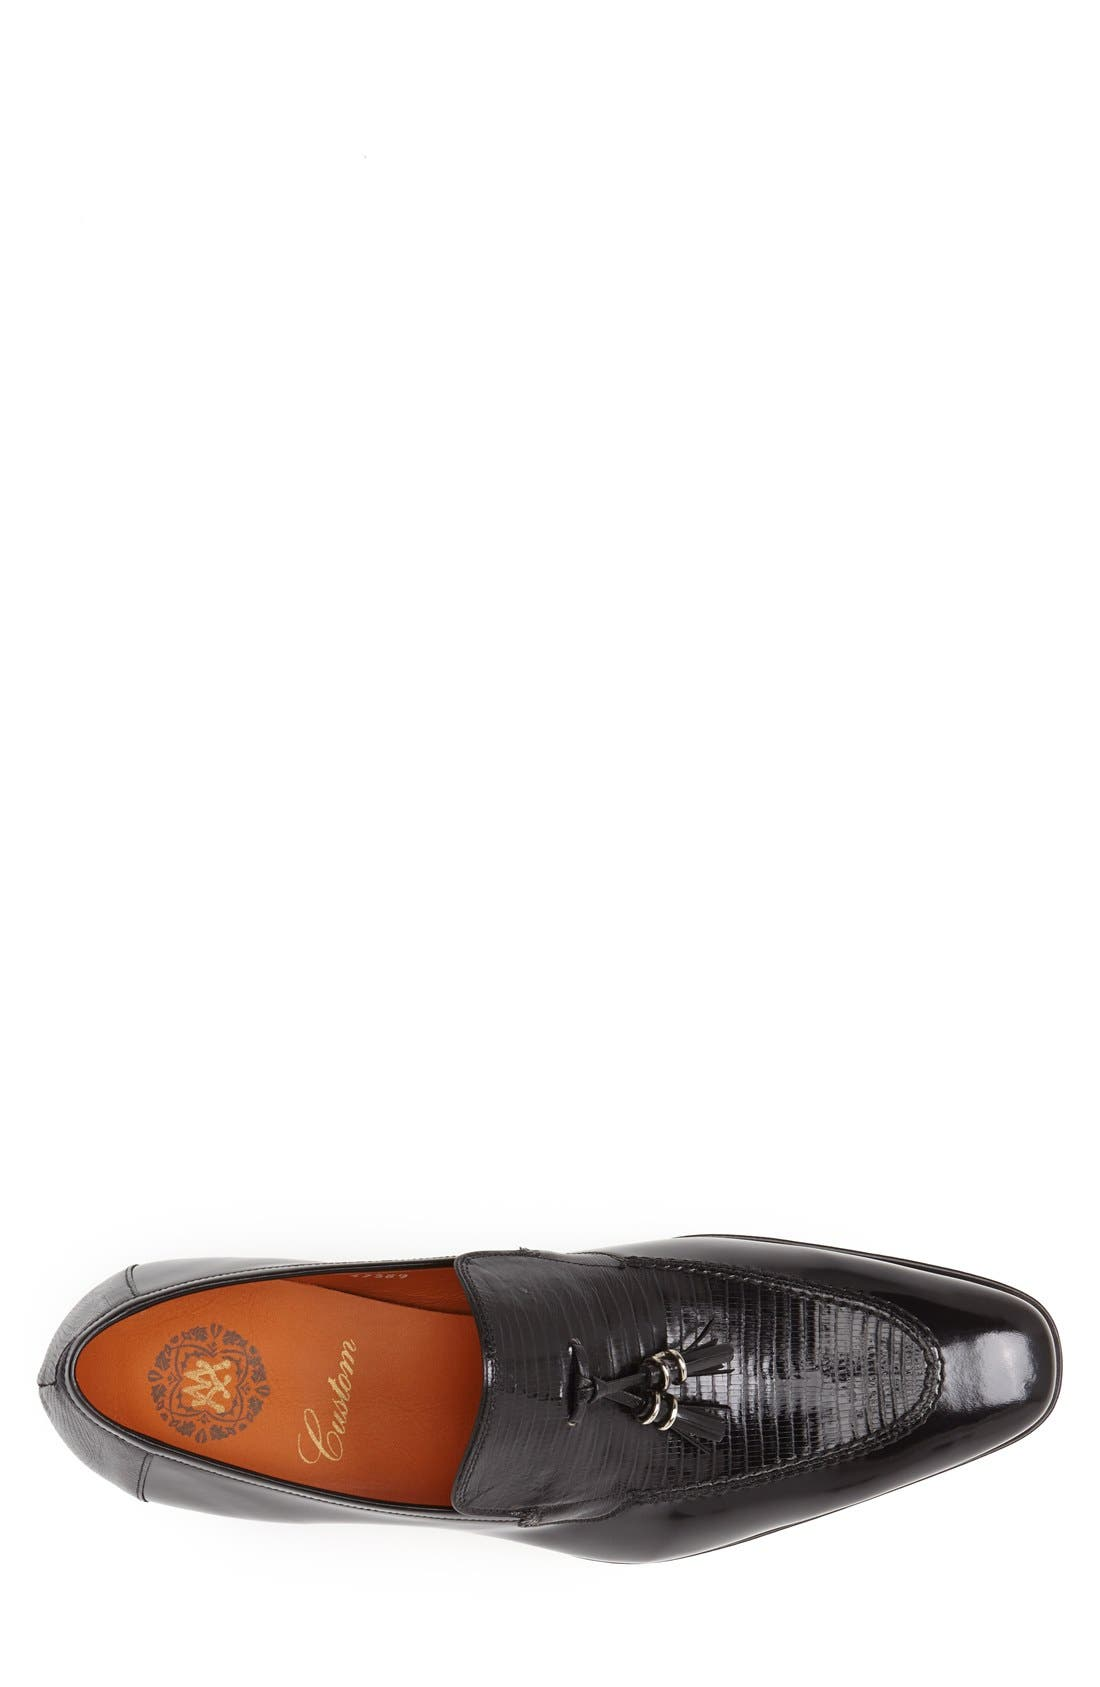 'Obrador' Lizard Leather Tassel Loafer,                             Alternate thumbnail 3, color,                             Black